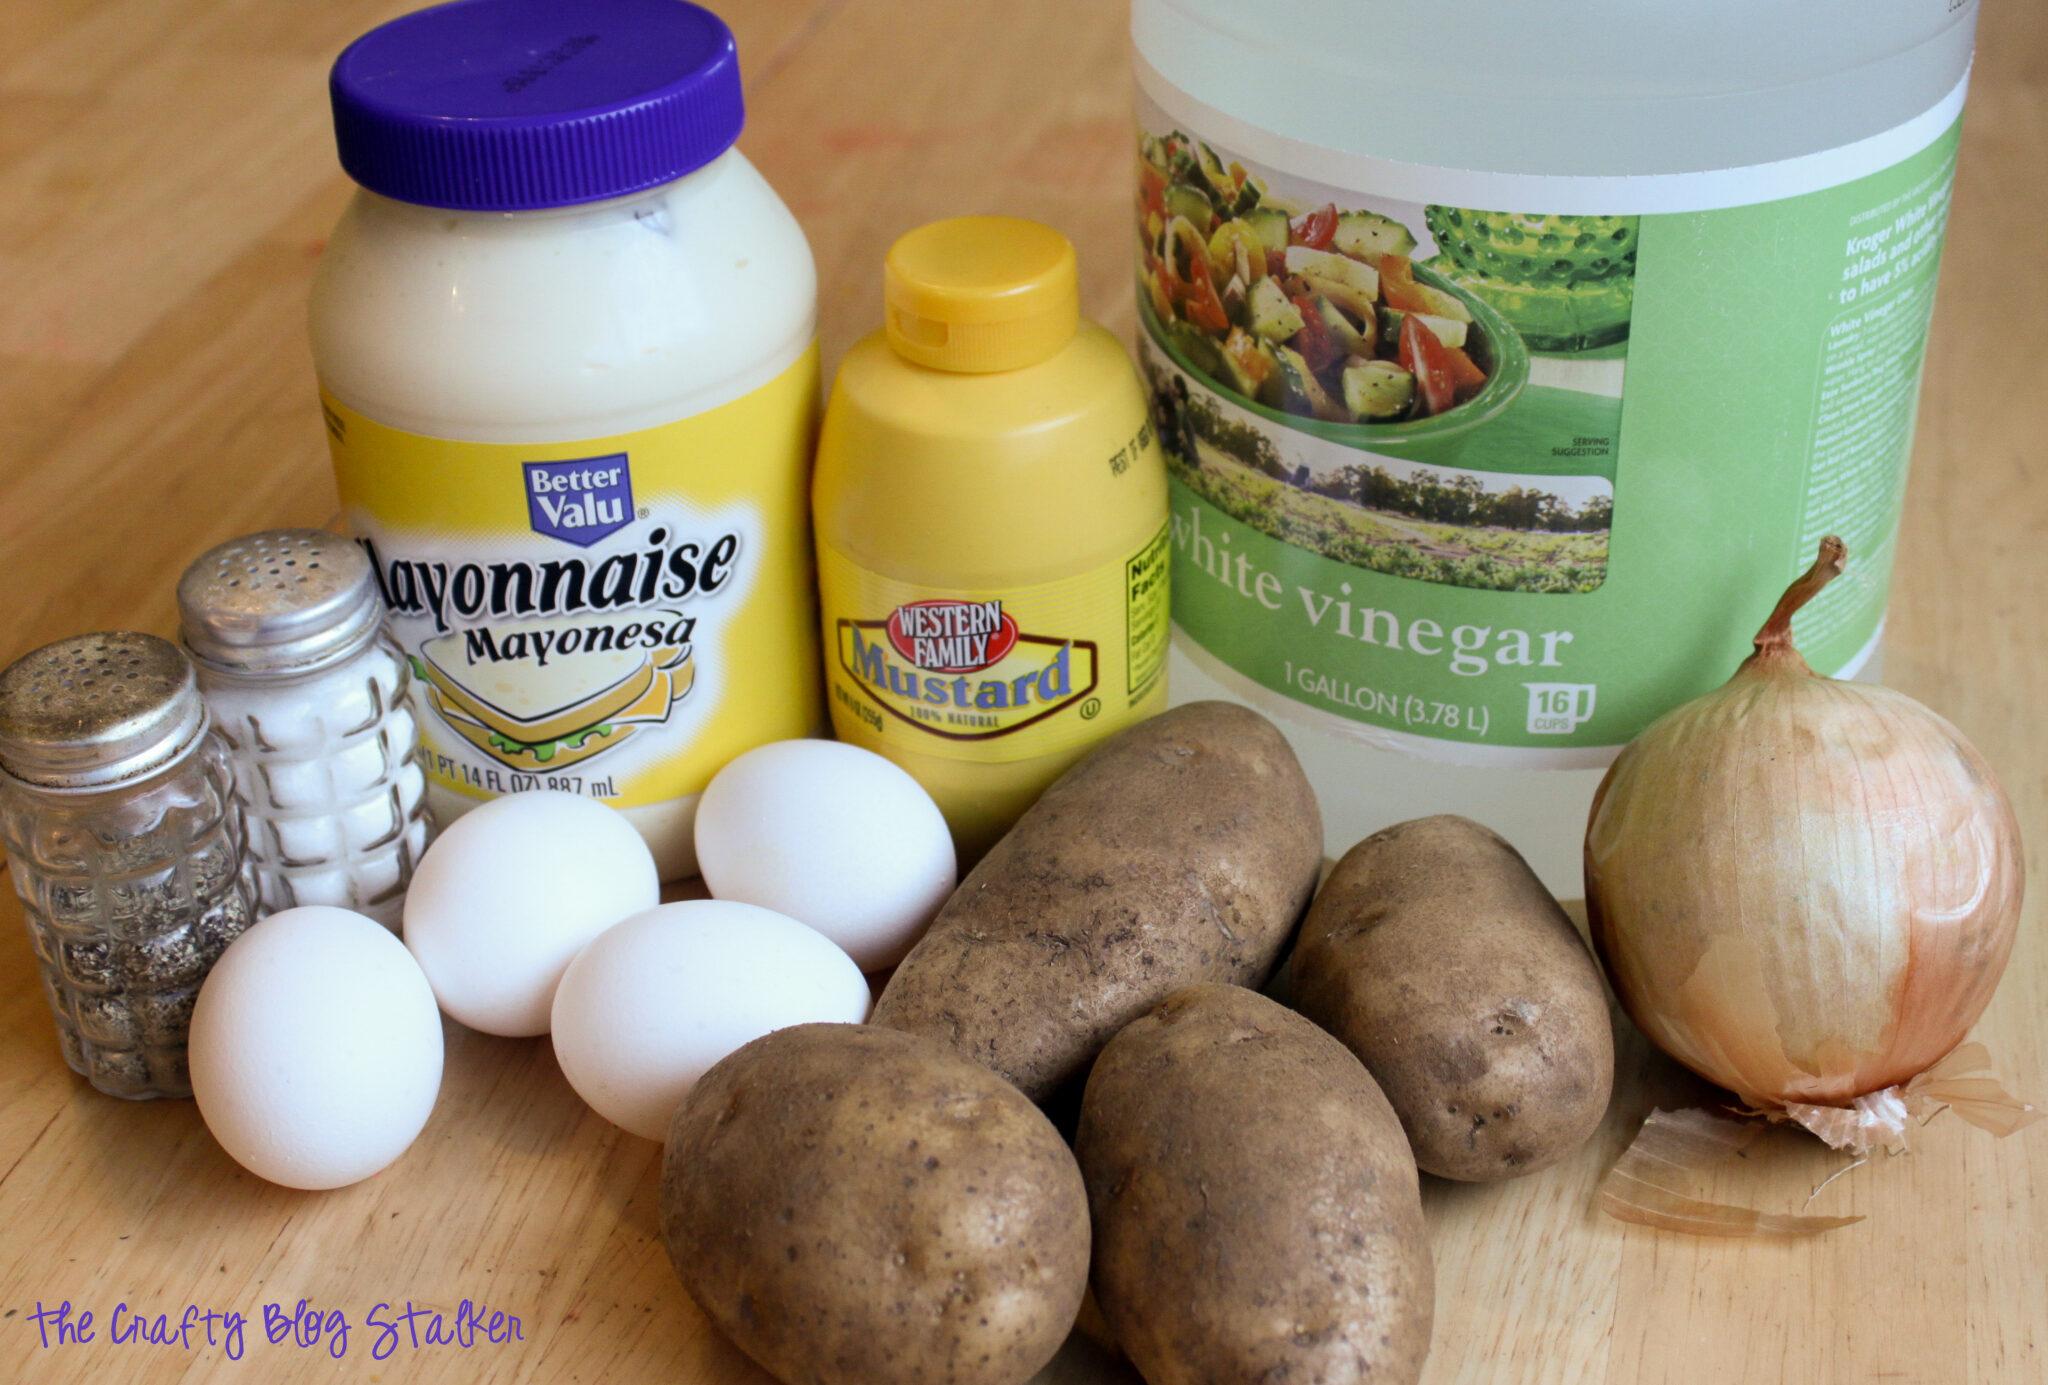 image of ingredients for potato salad